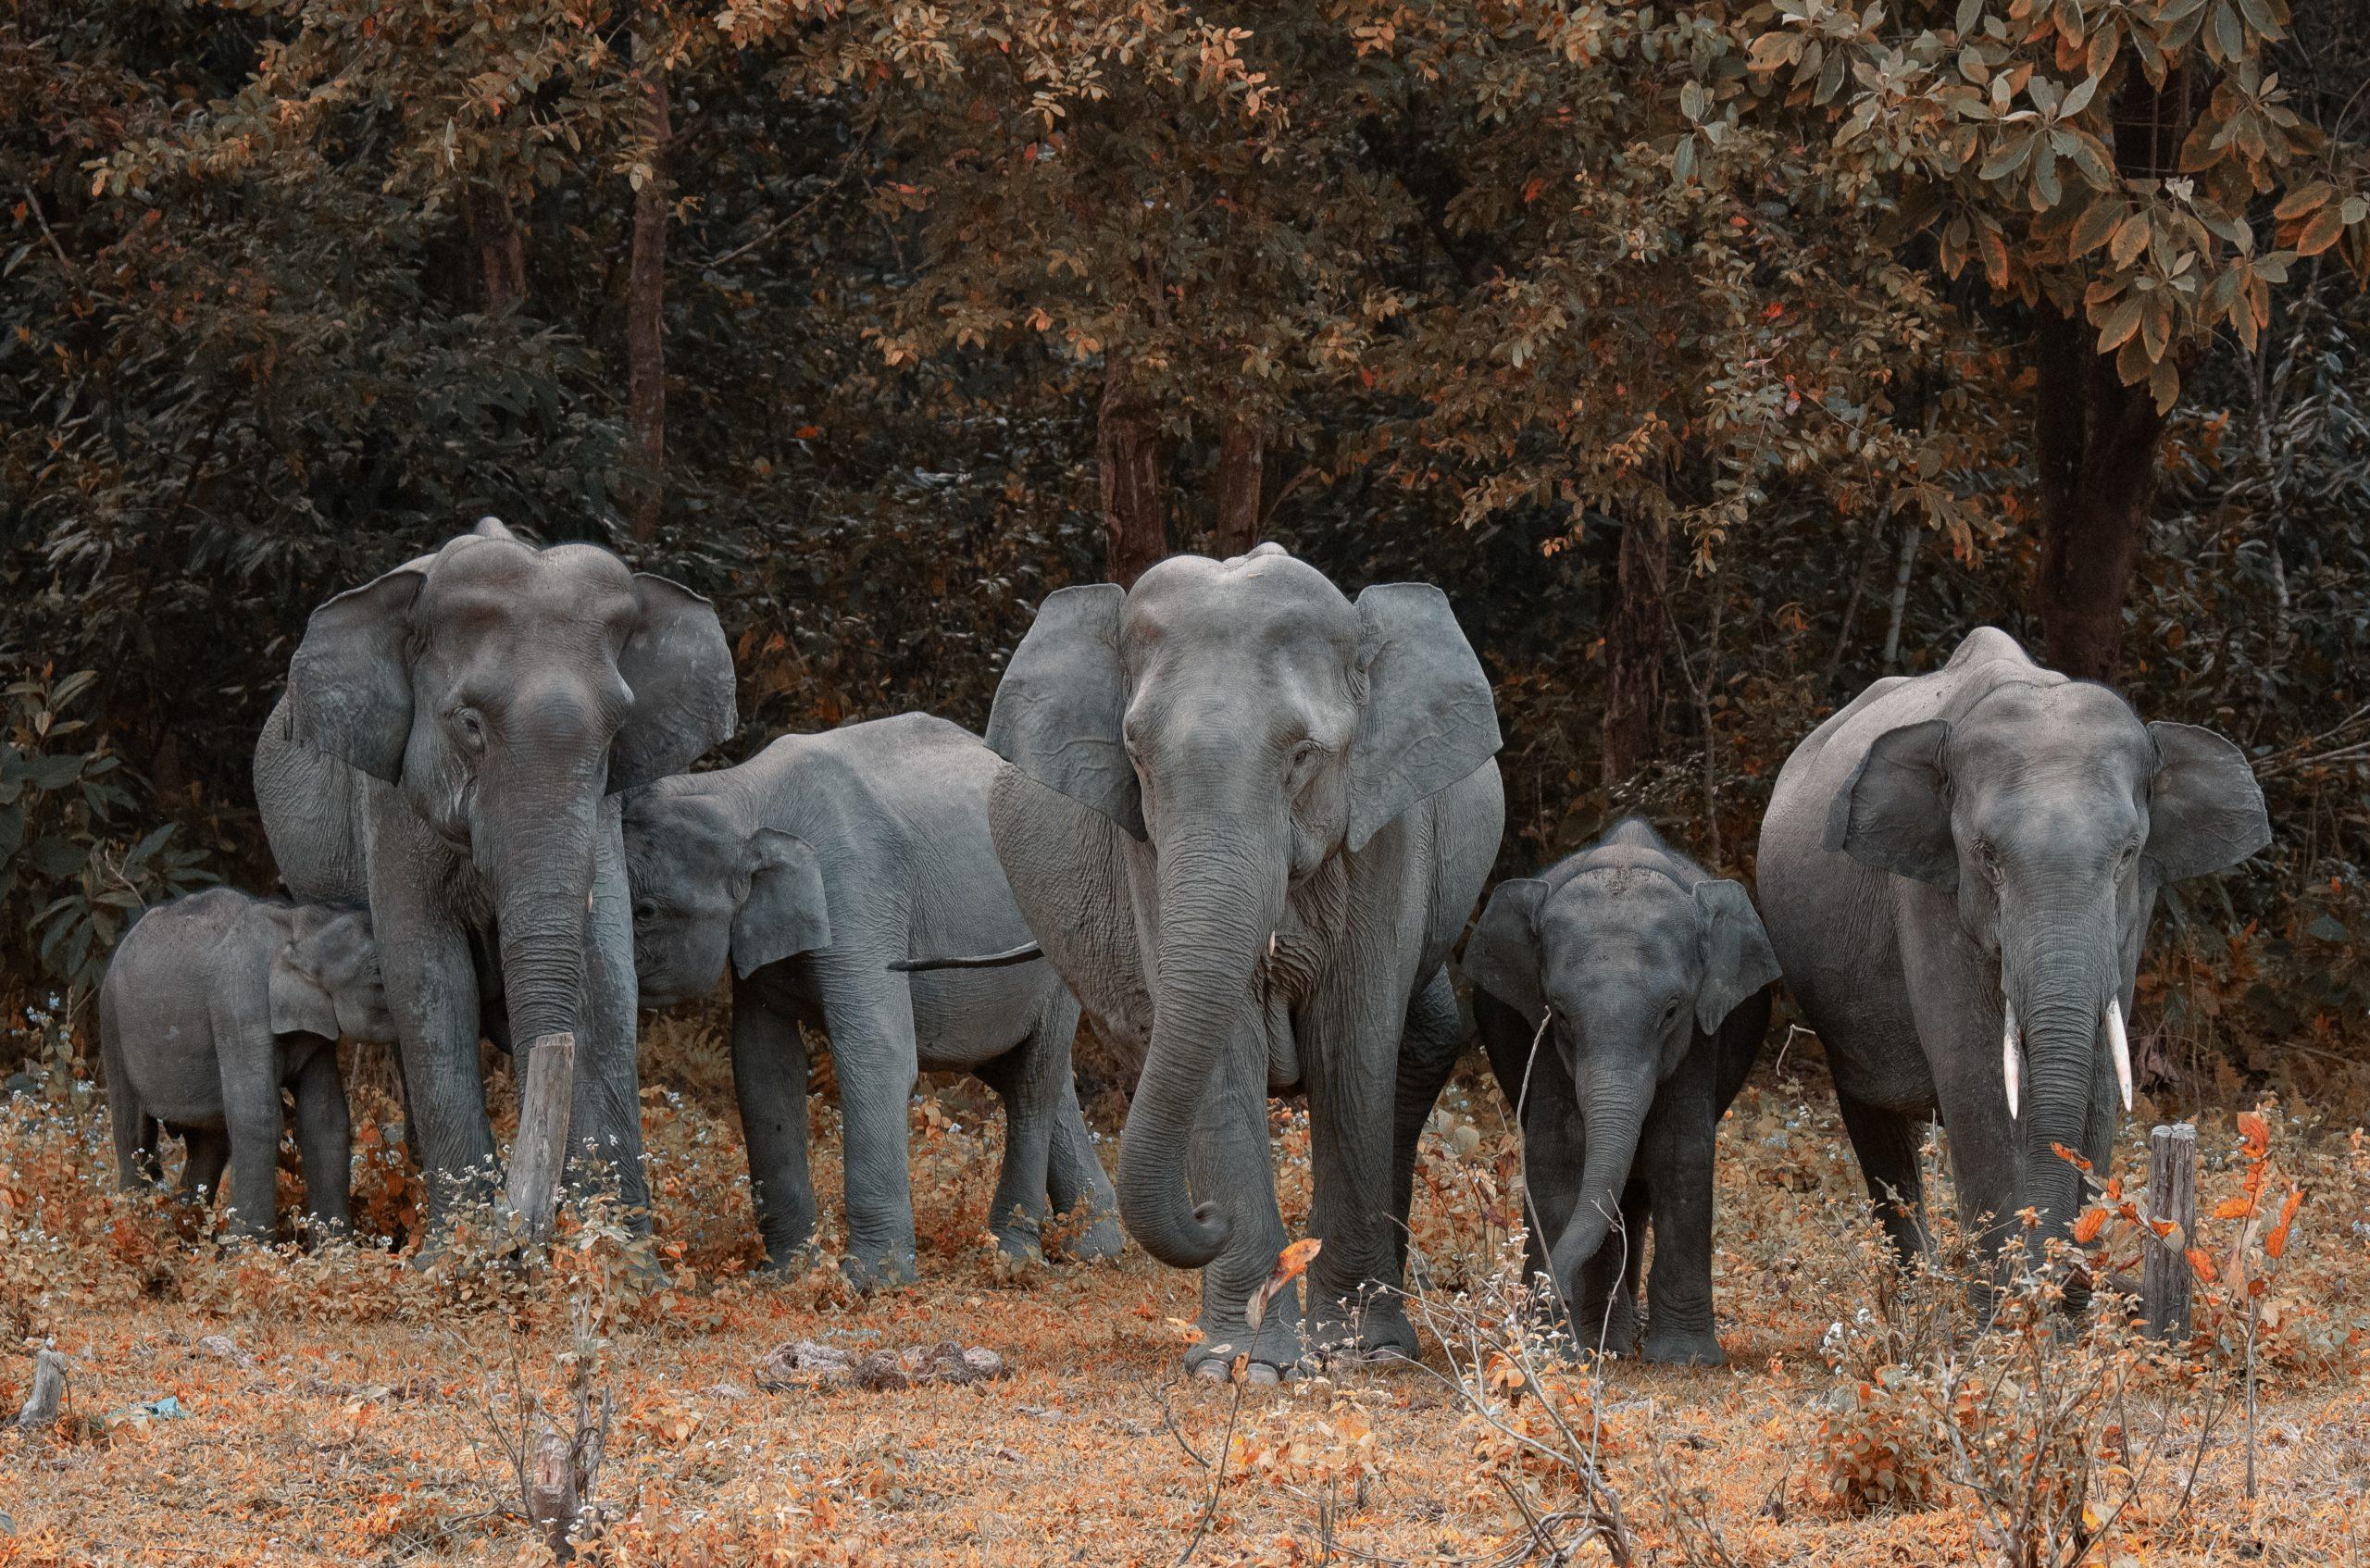 elephants_sauavges_thailande_asie_parc_natiional_khao_yai_bangkok_famille